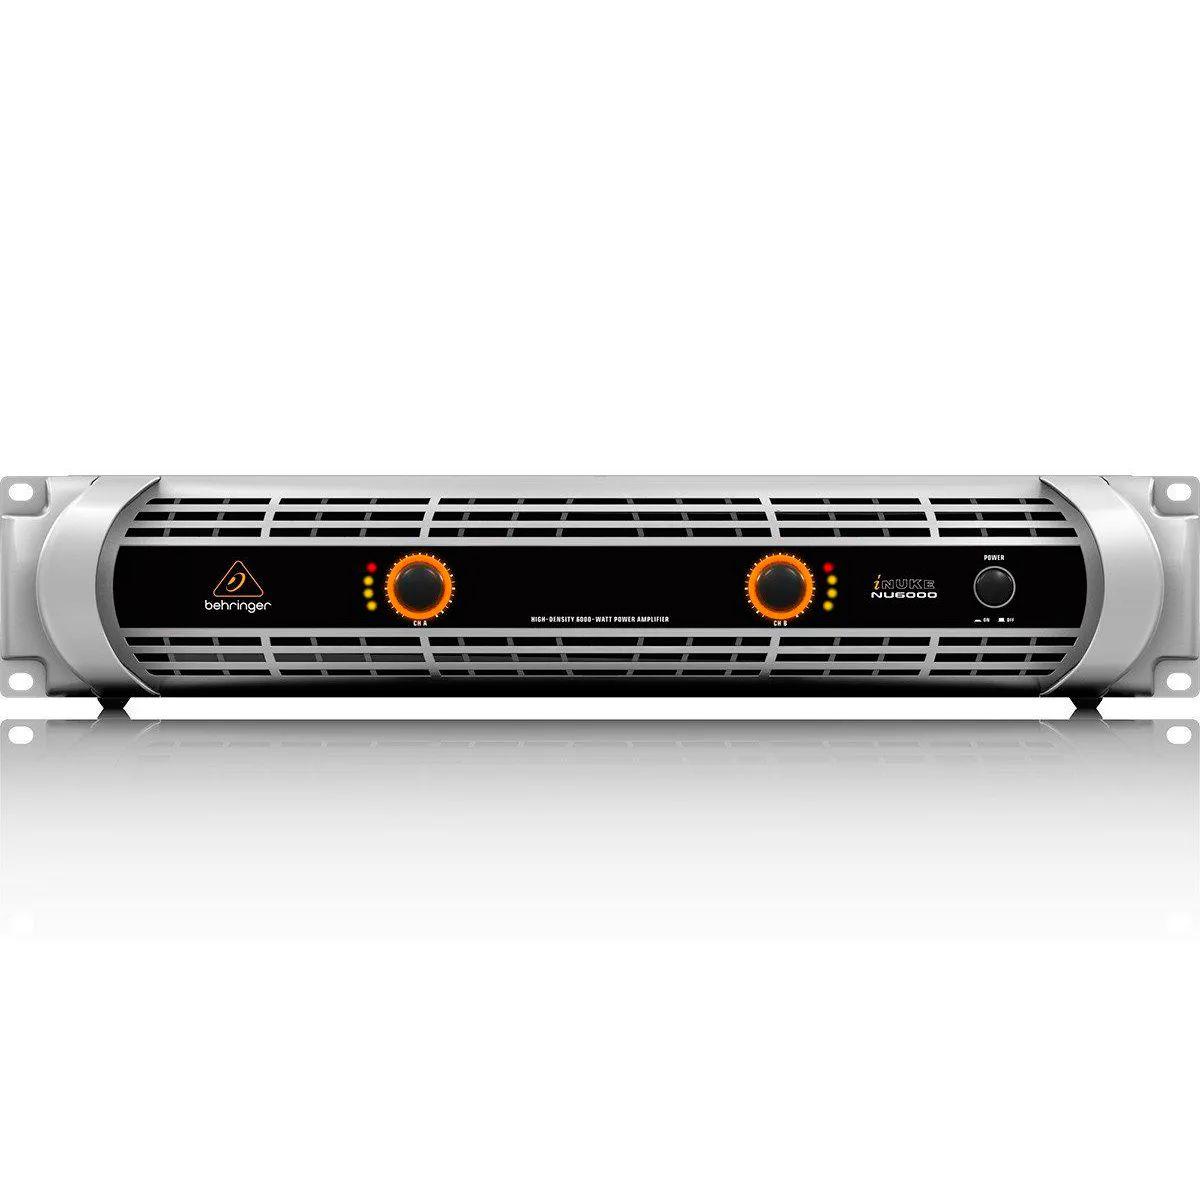 Amplificador de Potência Behringer Inuke NU3000 3000W